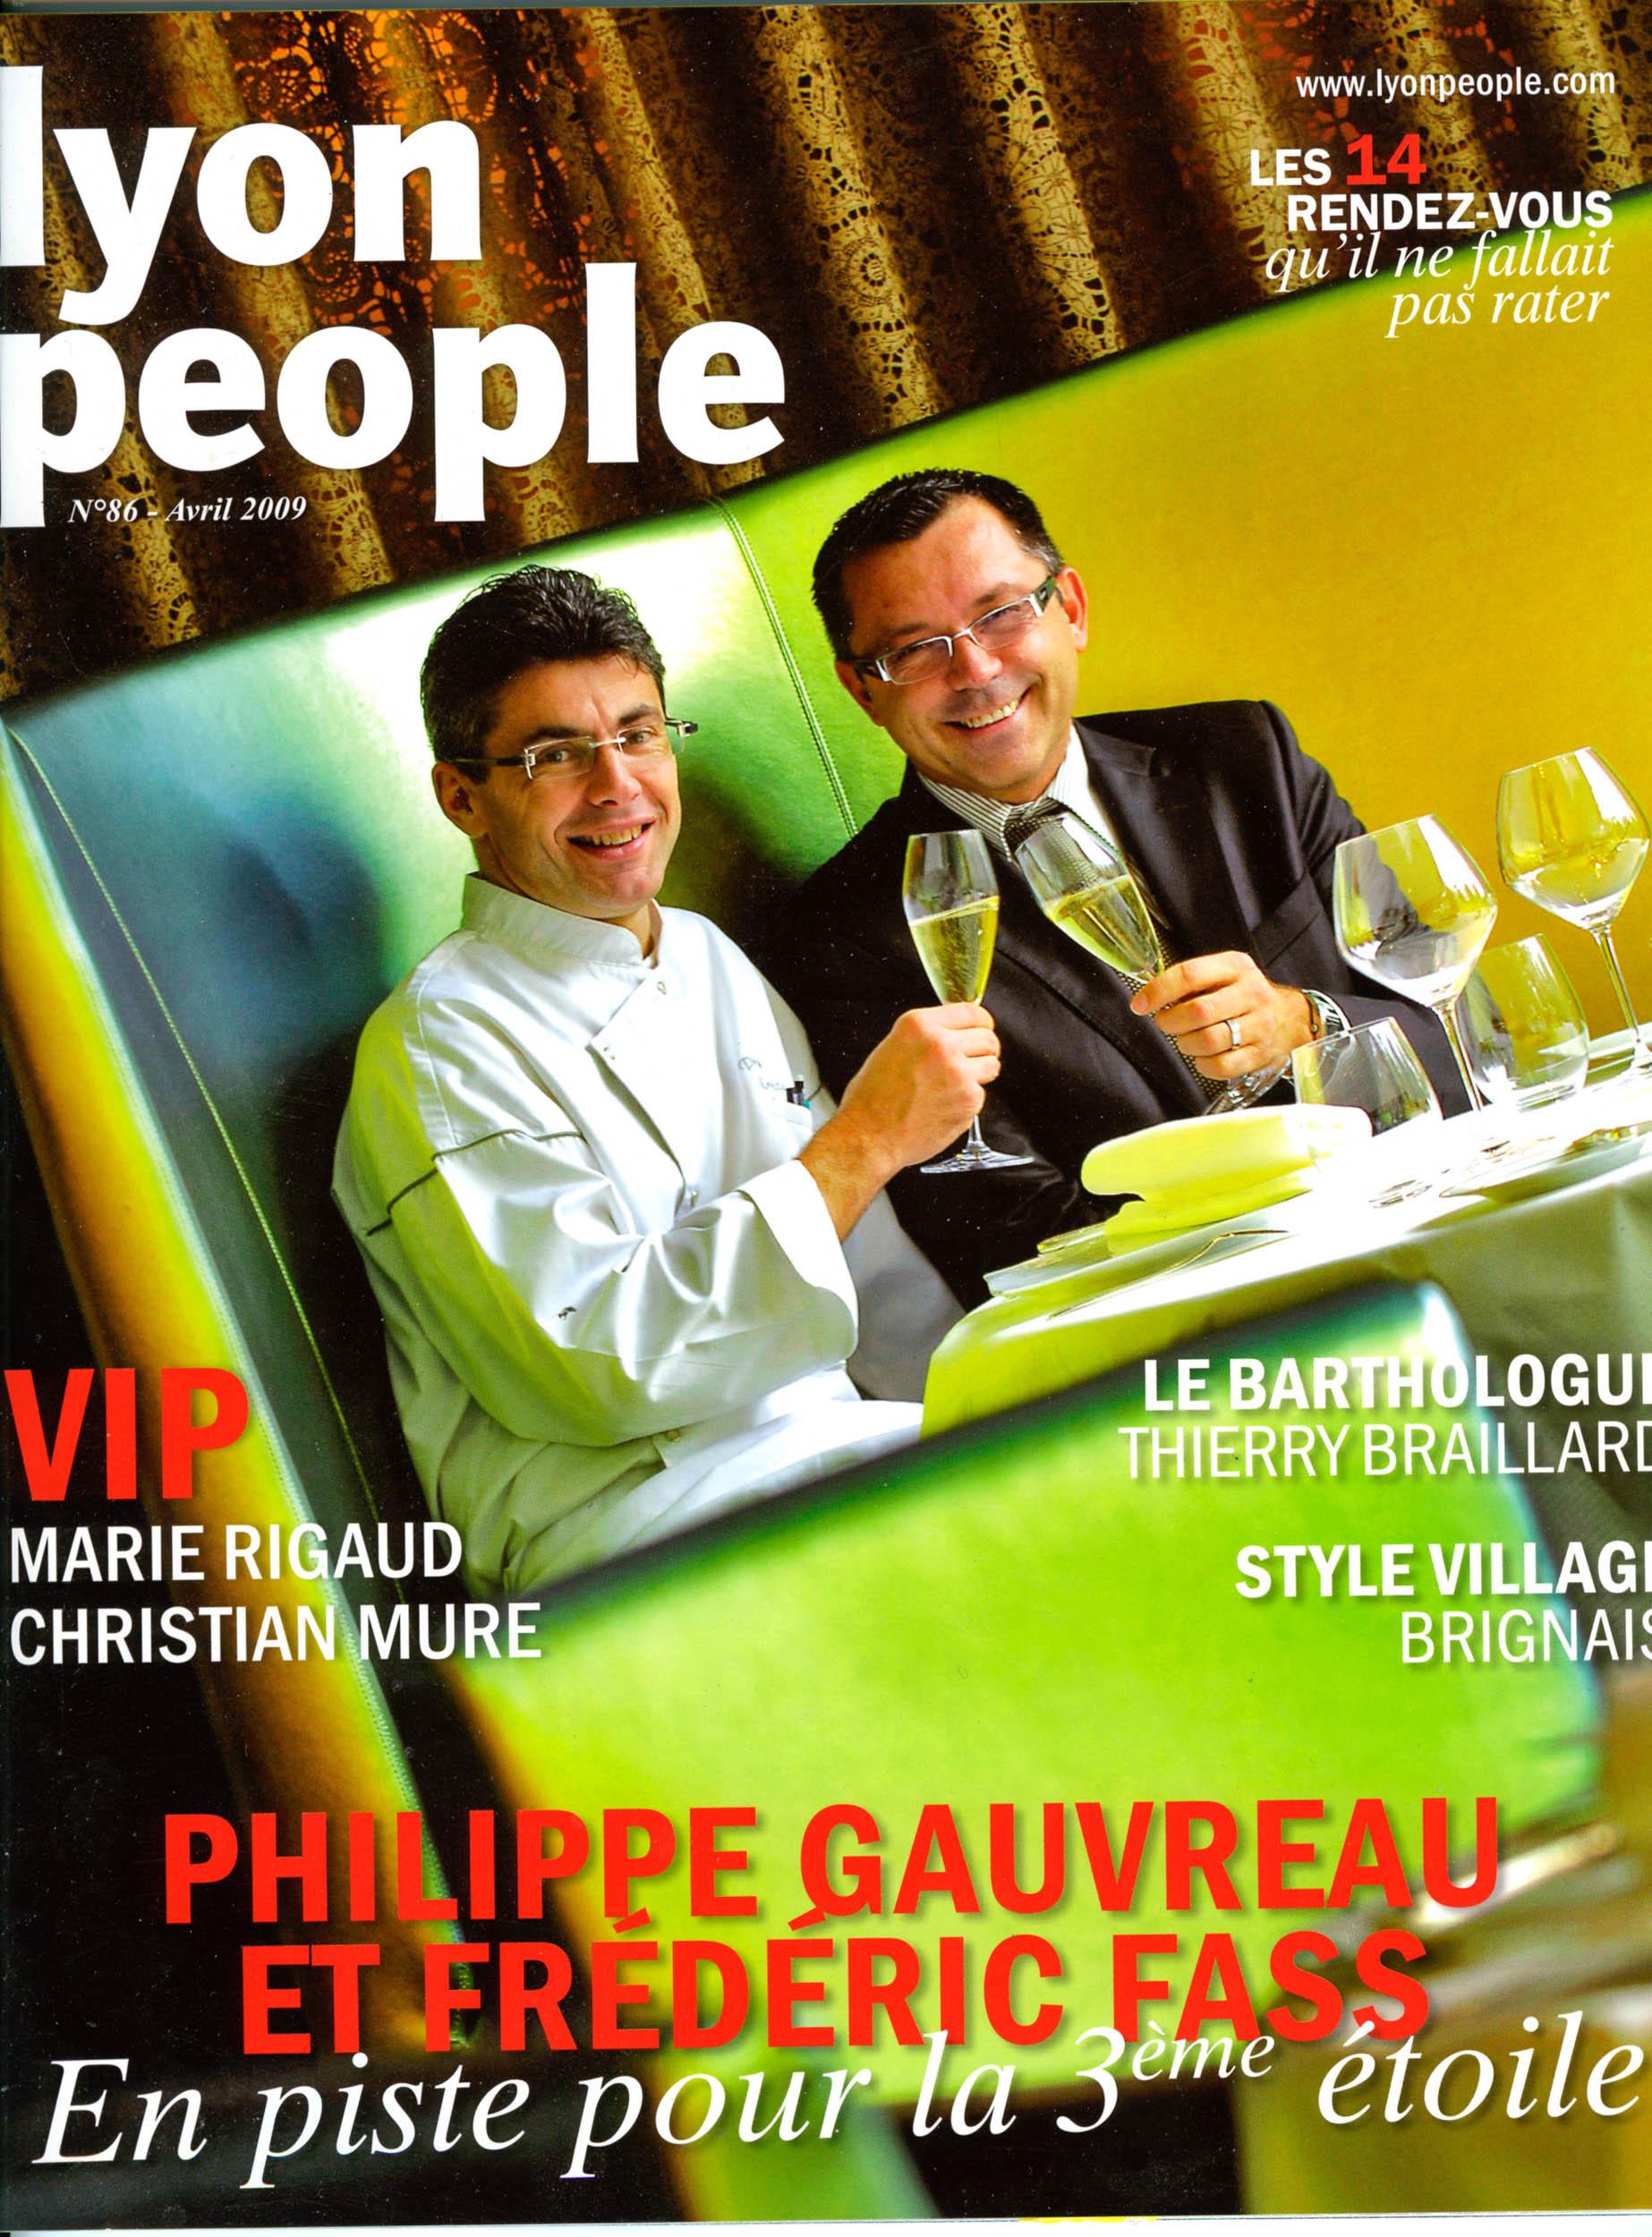 Philippe Gauvreau avril 2009-19.jpg